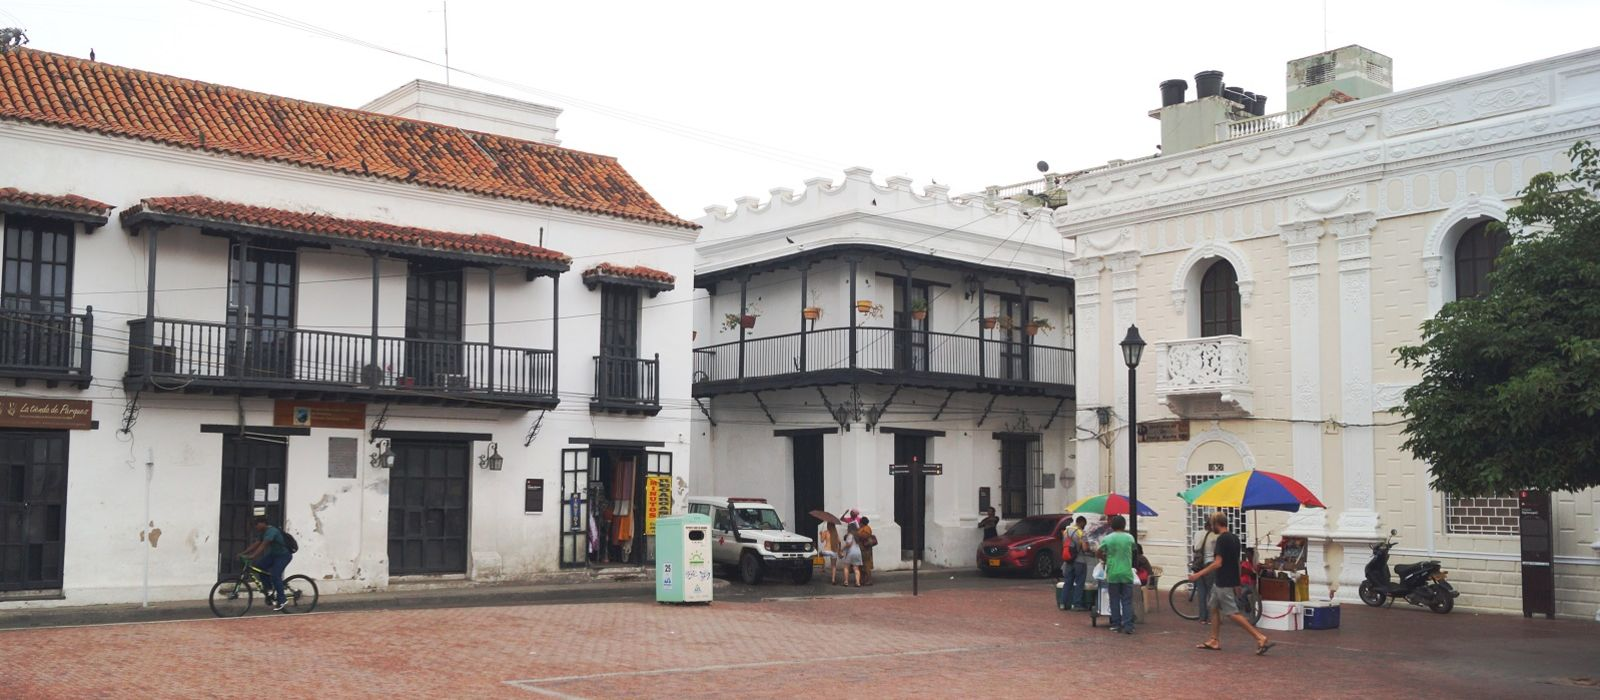 Reiseziel Santa Marta Kolumbien